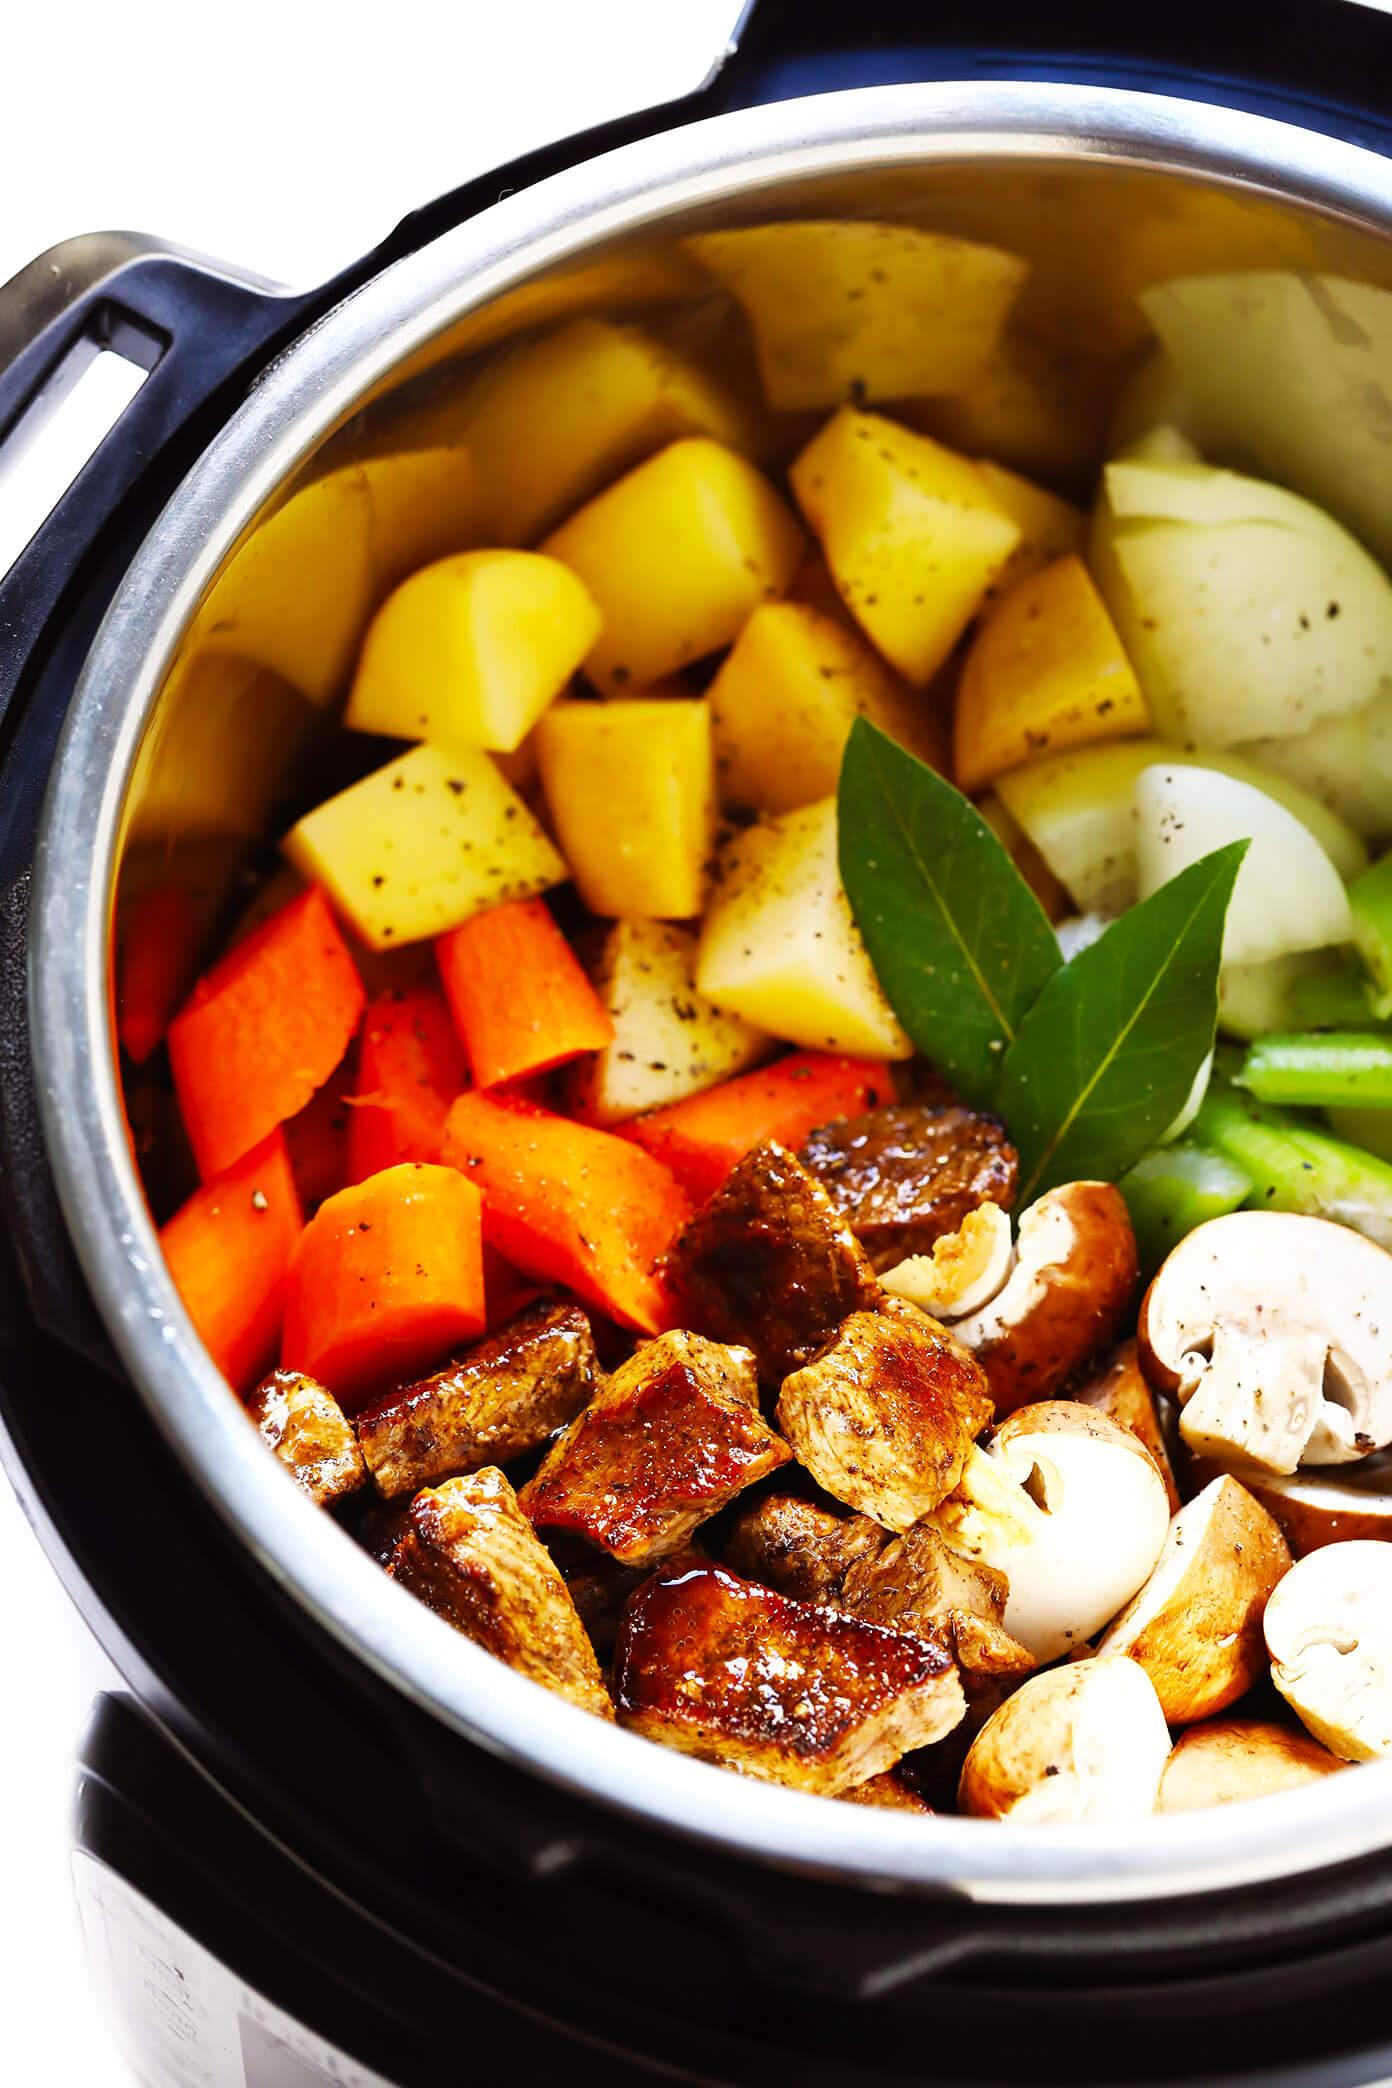 The Best Beef Stew Ingredients